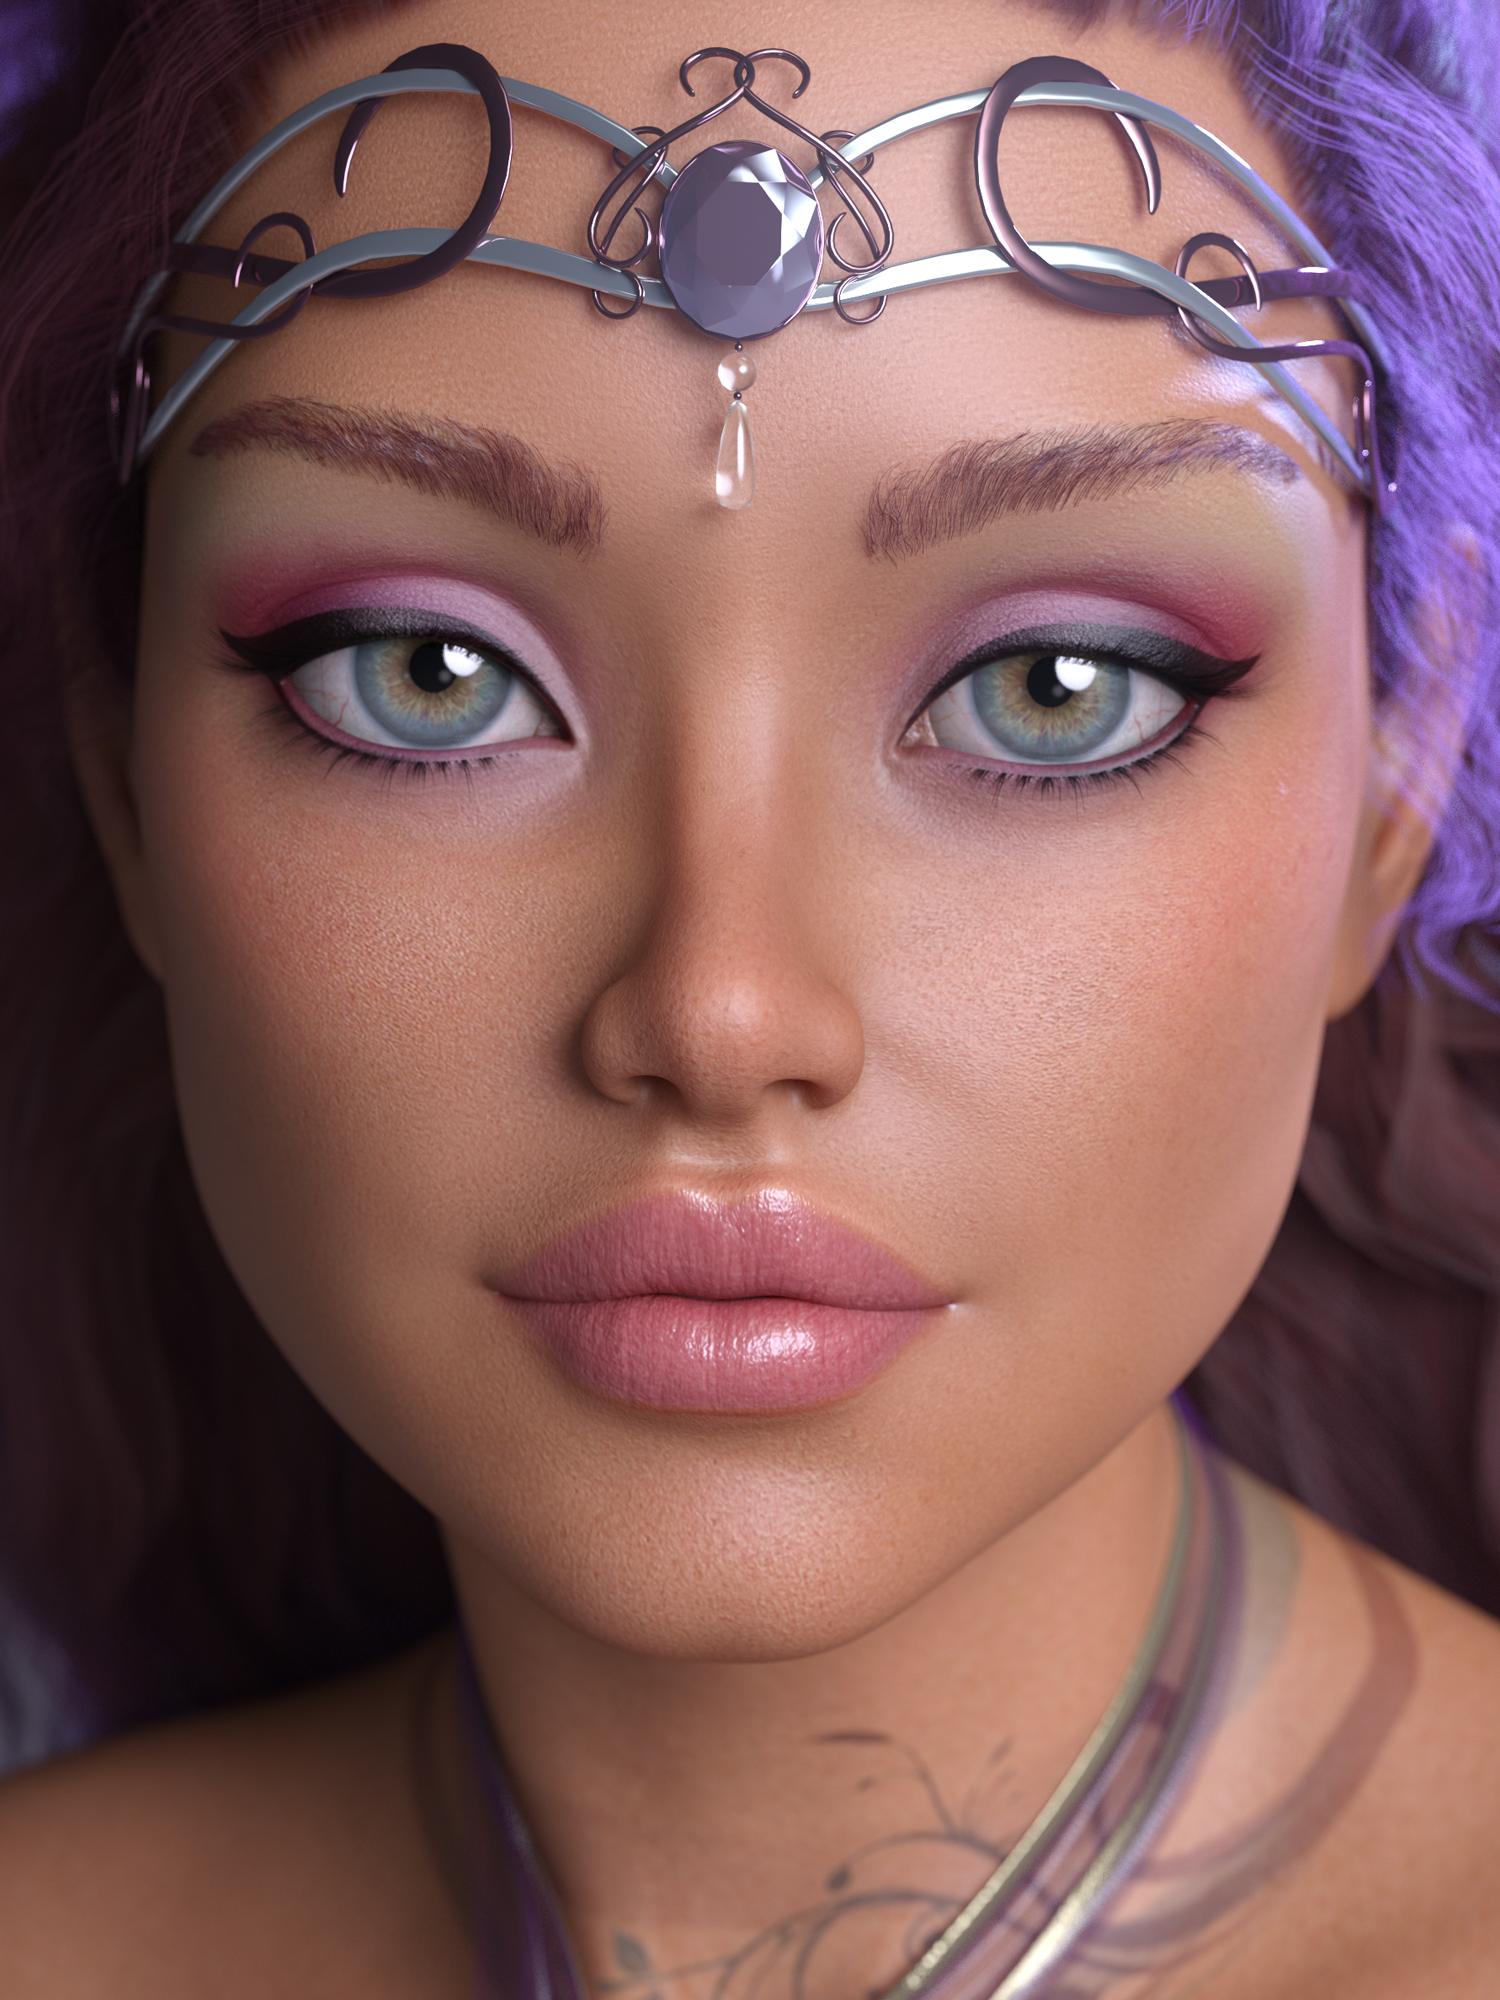 Alloralla for Aubrey 8 by: JessaiiAdiene, 3D Models by Daz 3D